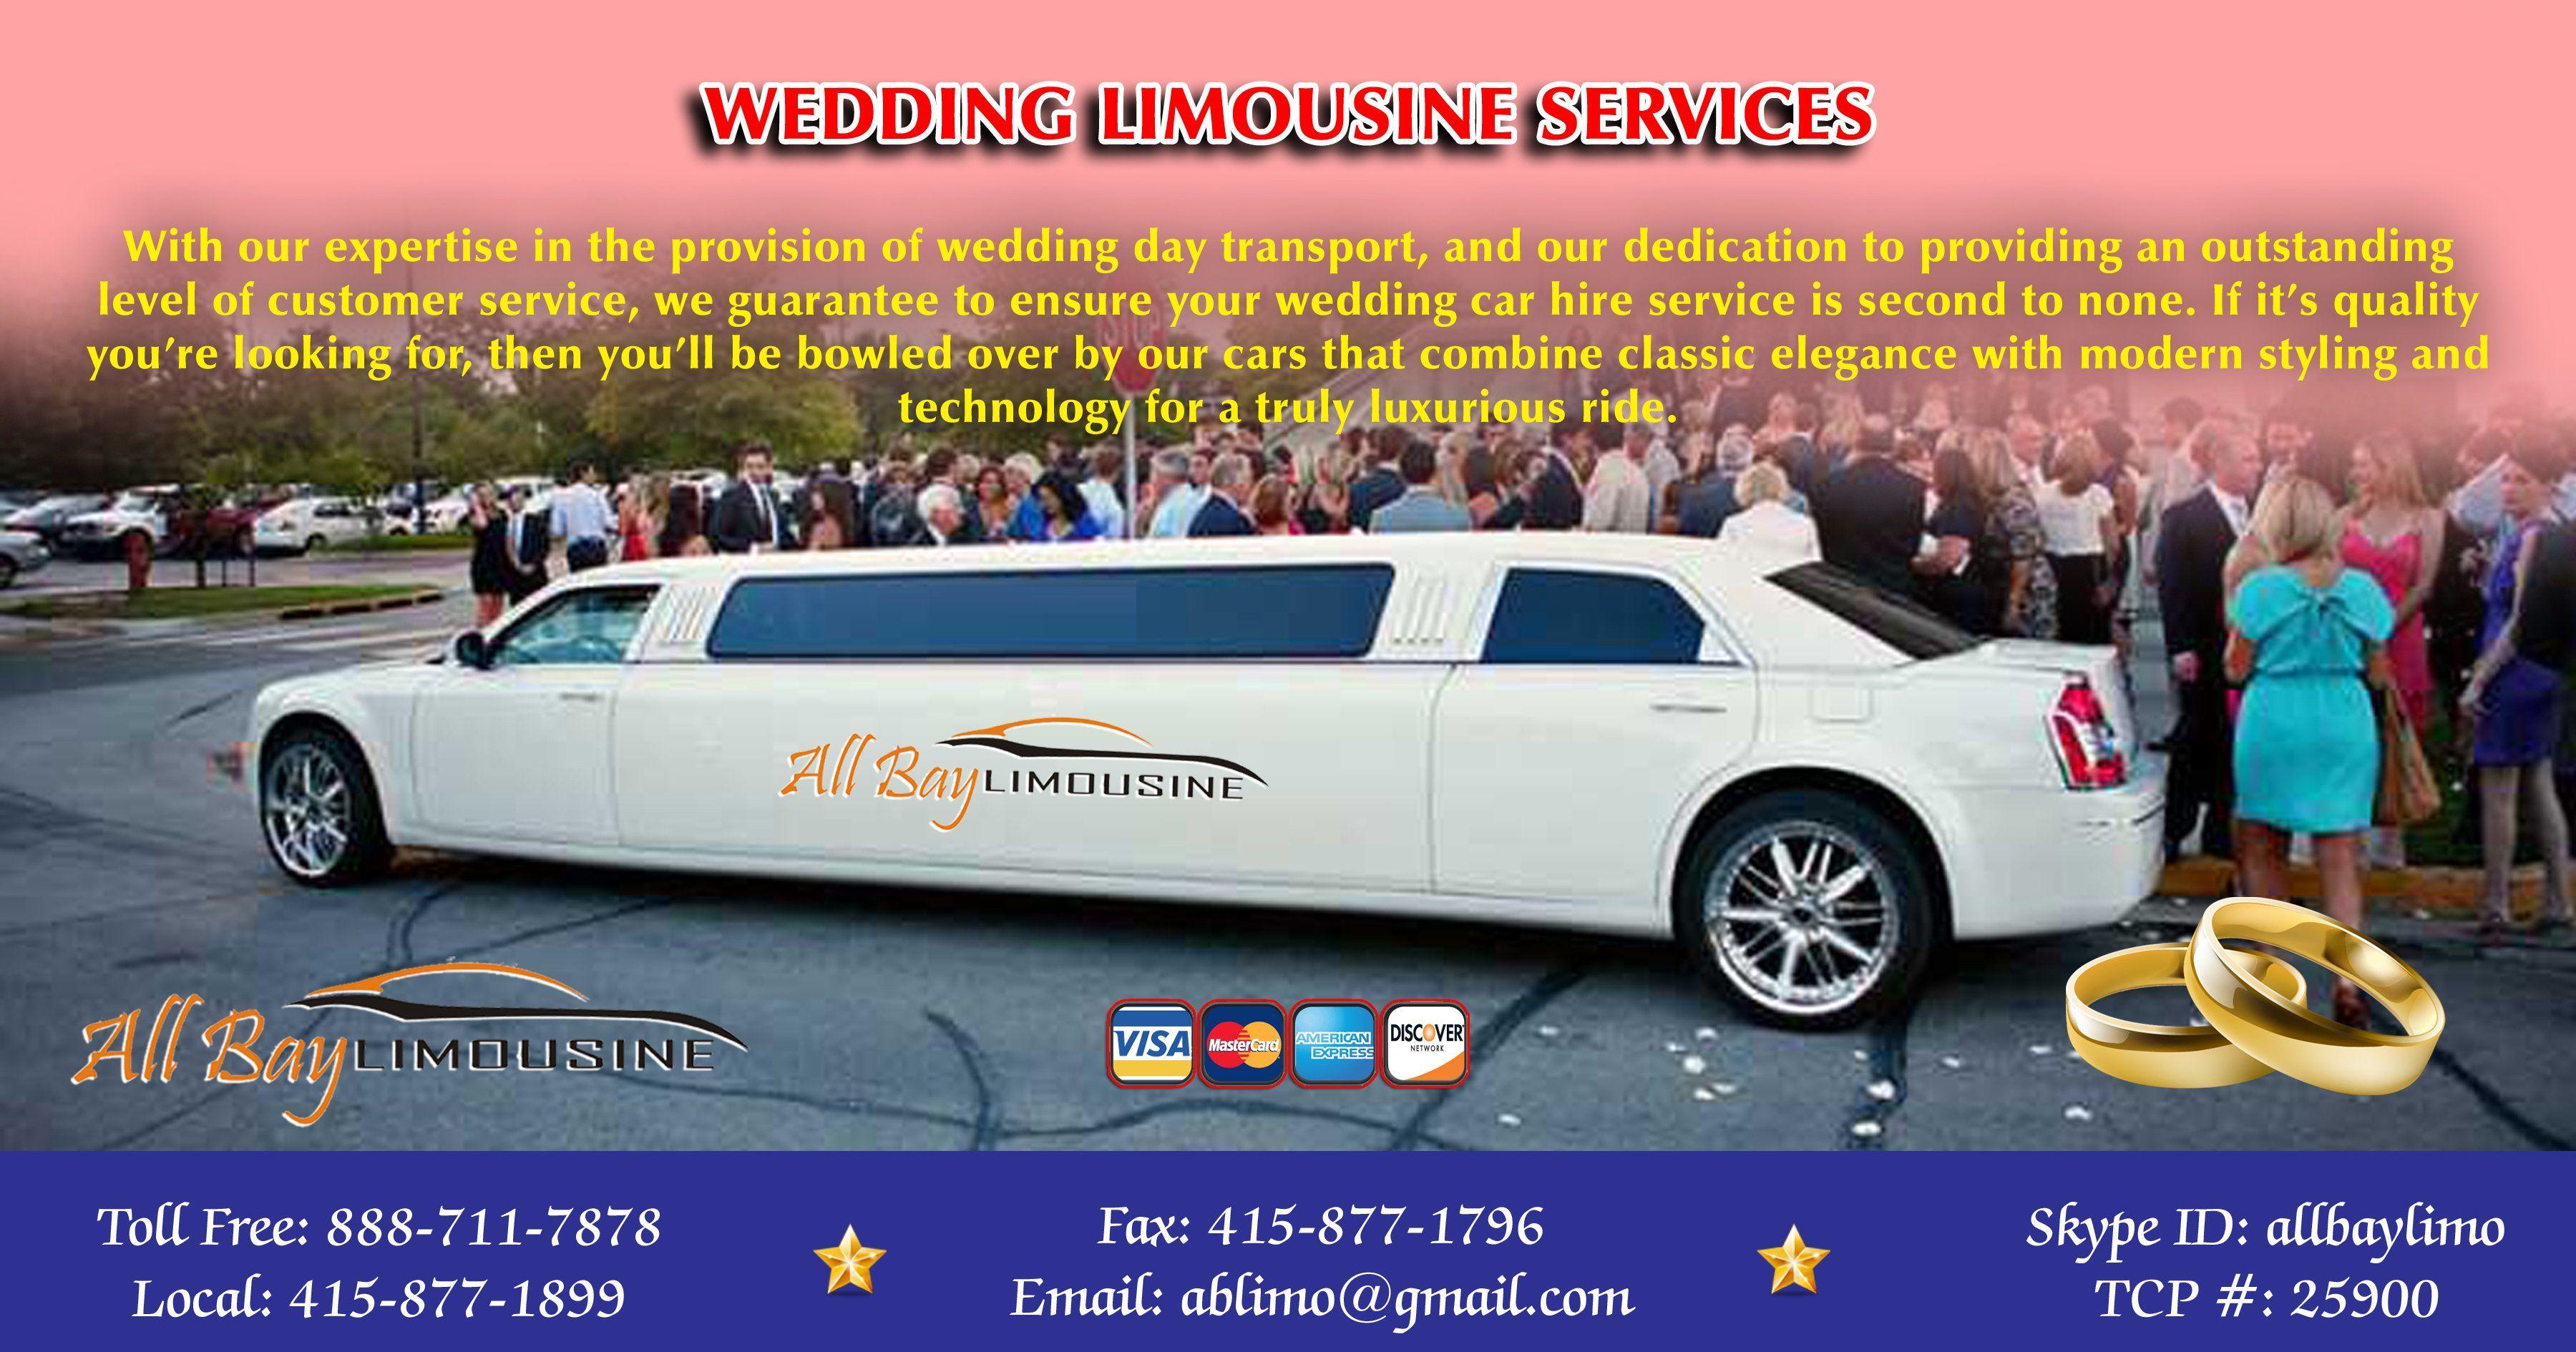 Wedding Limousine Services In San Francisco Limousine Wedding Car Hire Limo